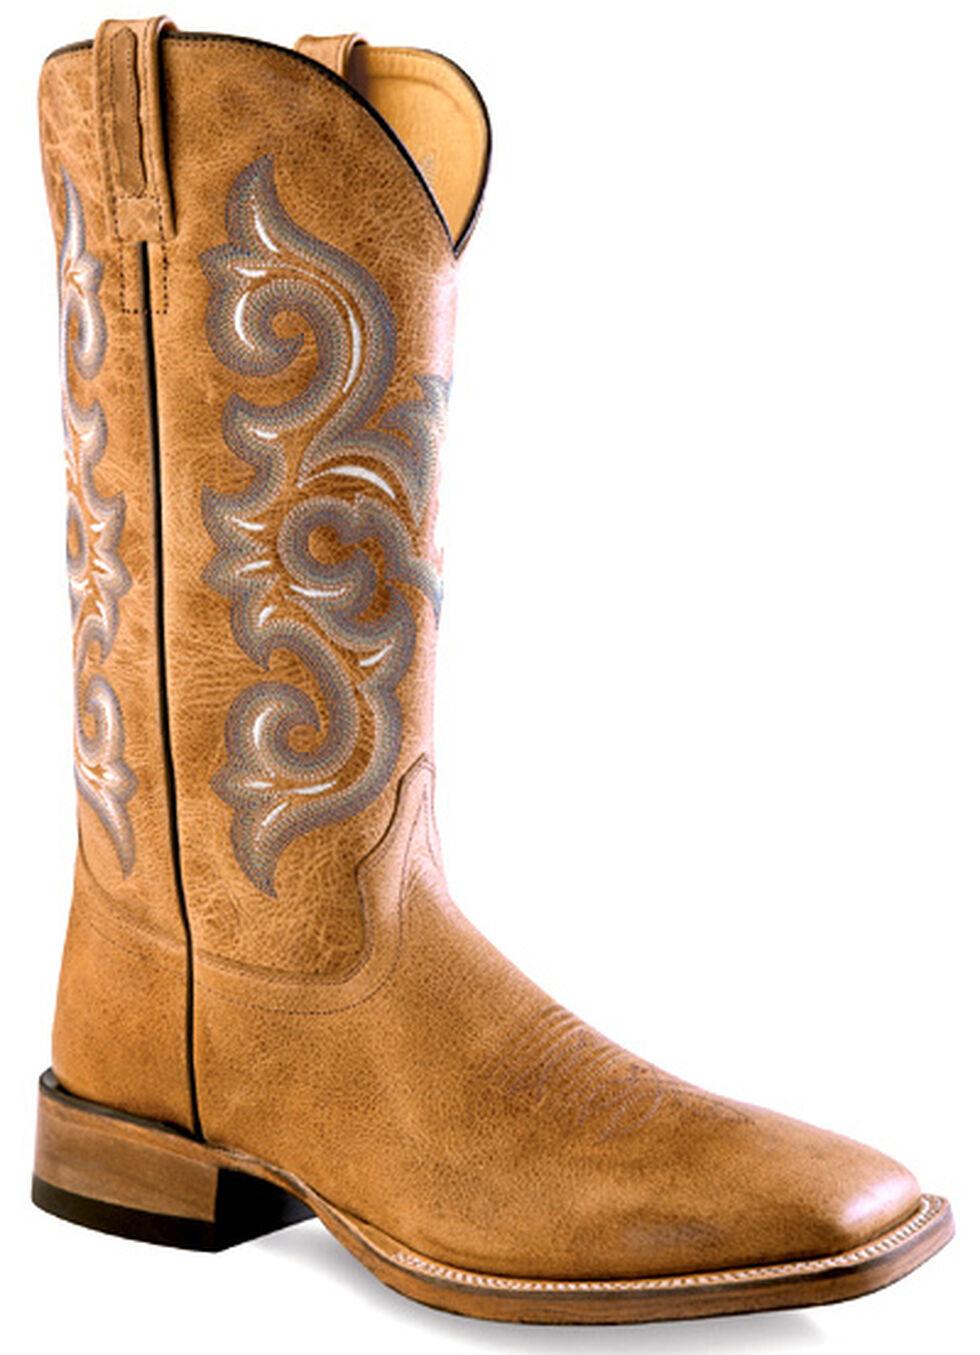 Old West Men's Golden Tan Western Boots - Square Toe , Tan, hi-res